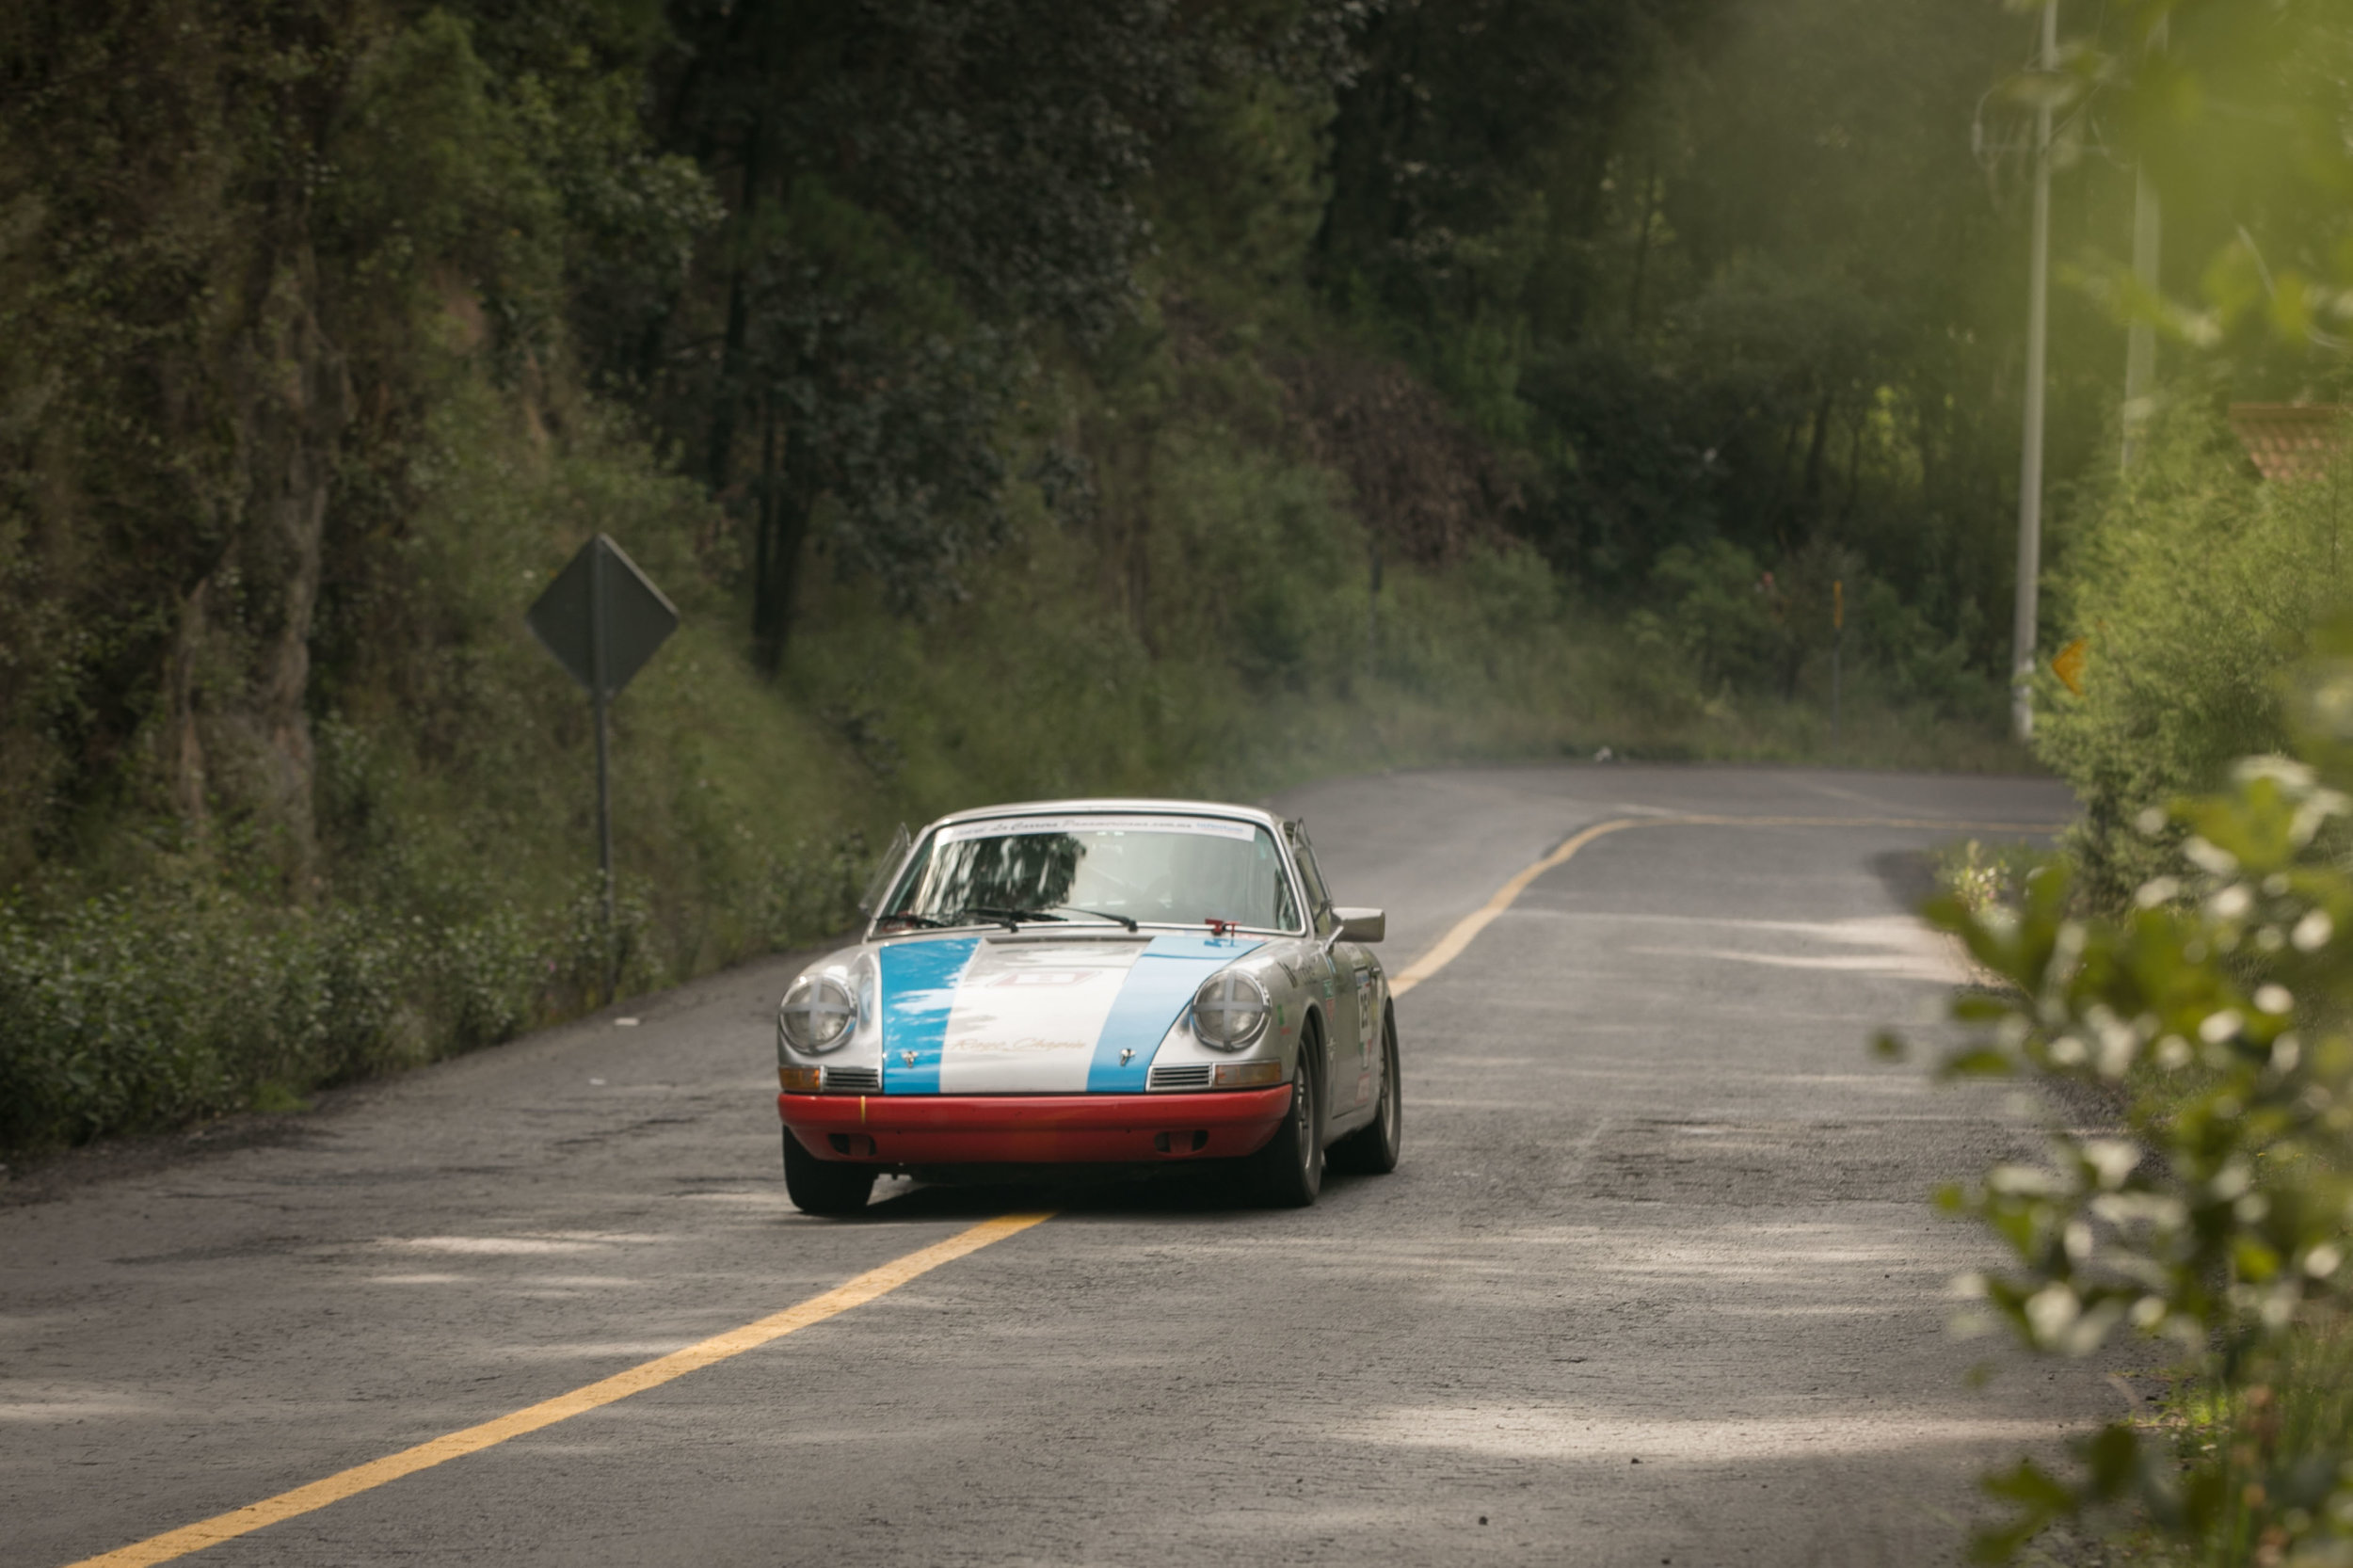 Carrera Panamericana_2 (2 of 3).jpg